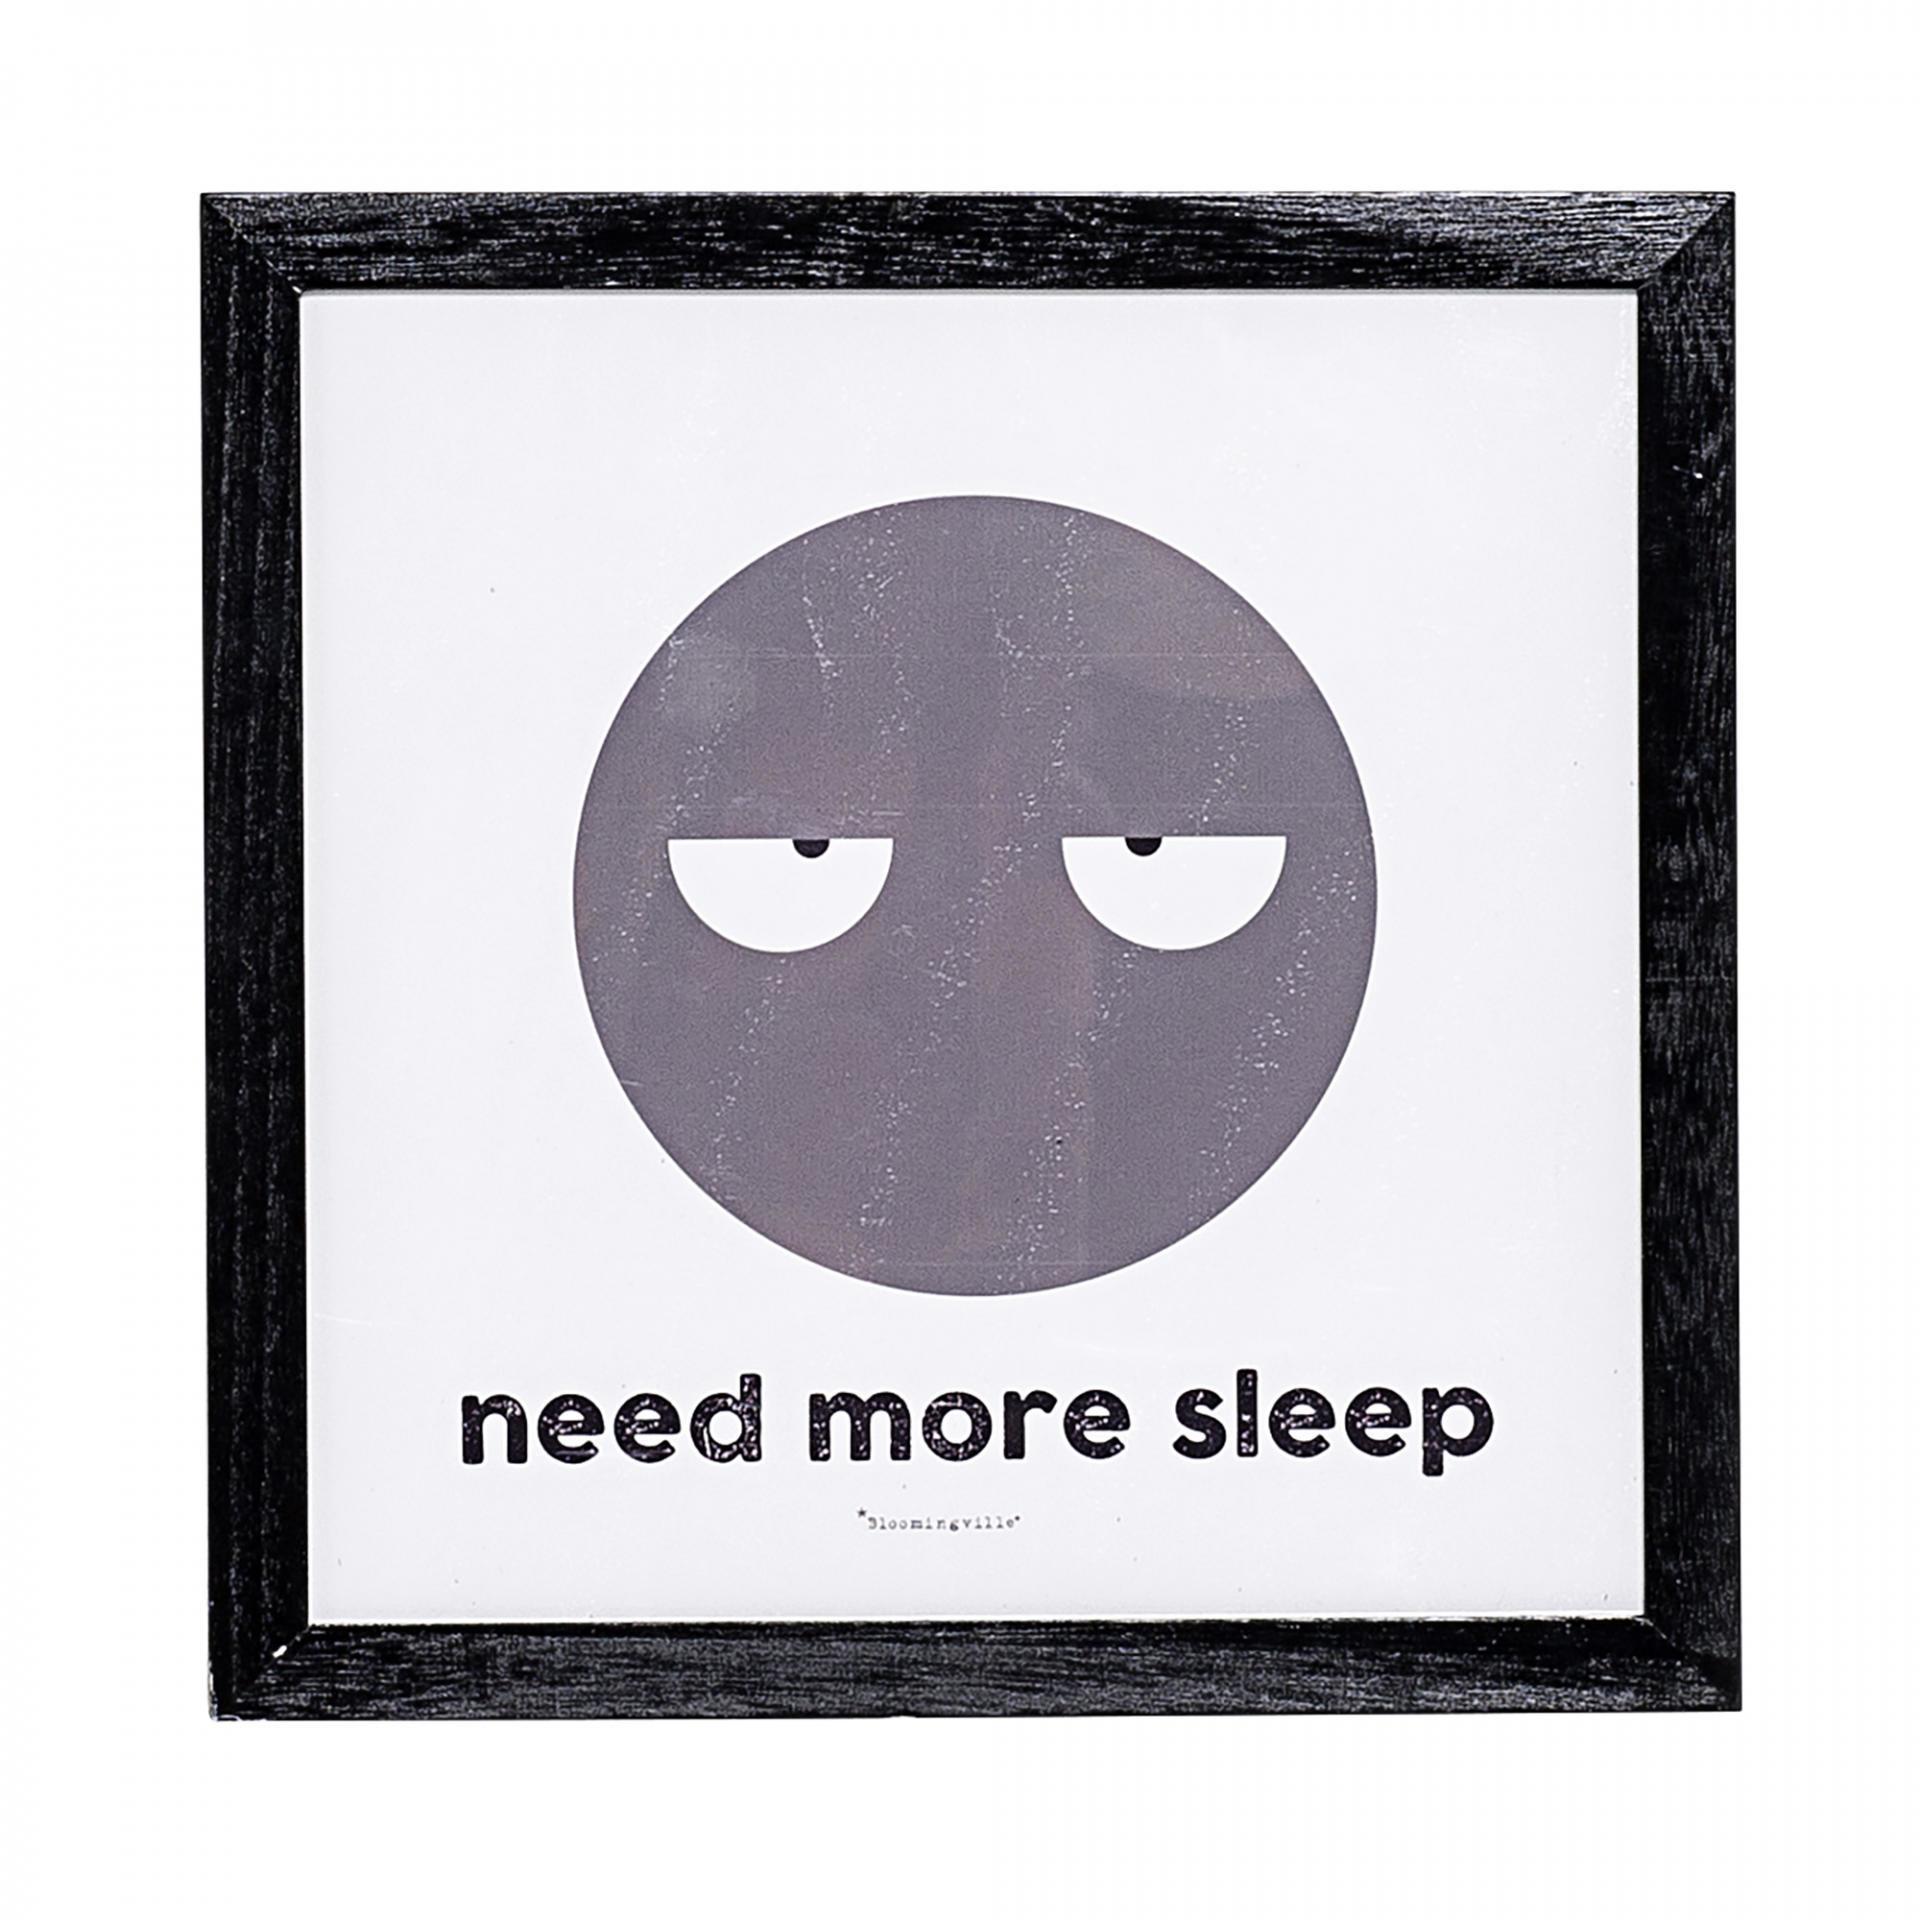 Bloomingville Obrázek Need more sleep, šedá barva, černá barva, dřevo